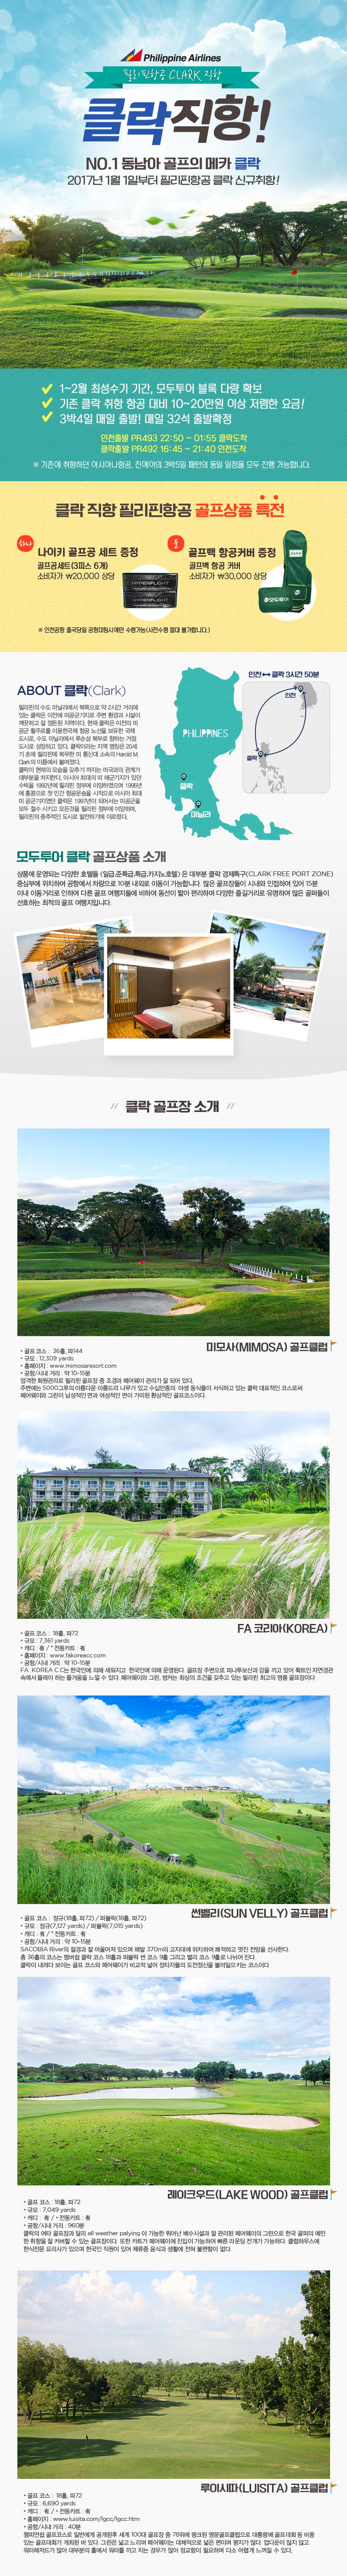 NO.1 동남아 골프의 메카 클락!